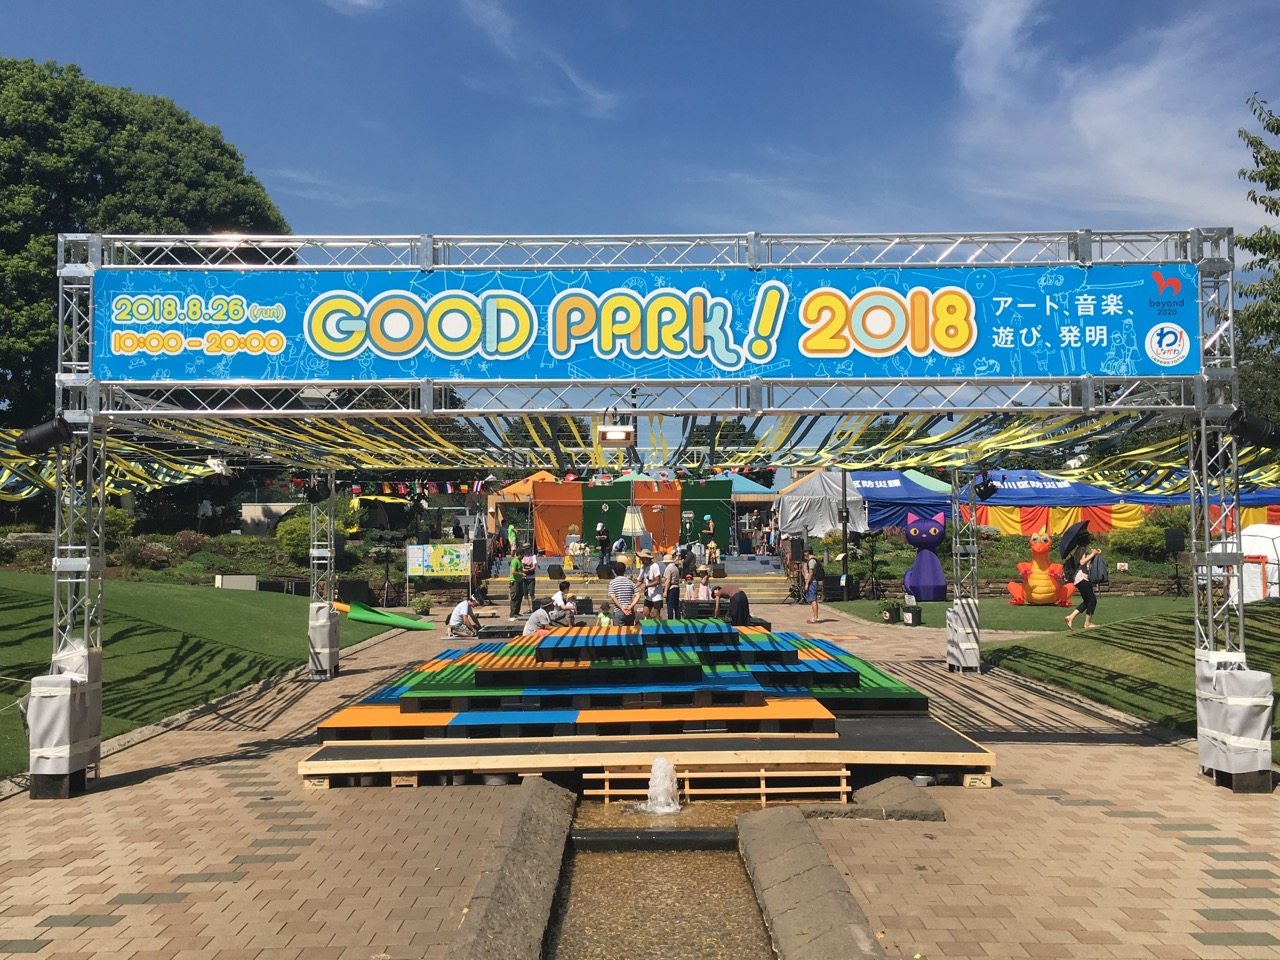 GOOD PARK! 2018